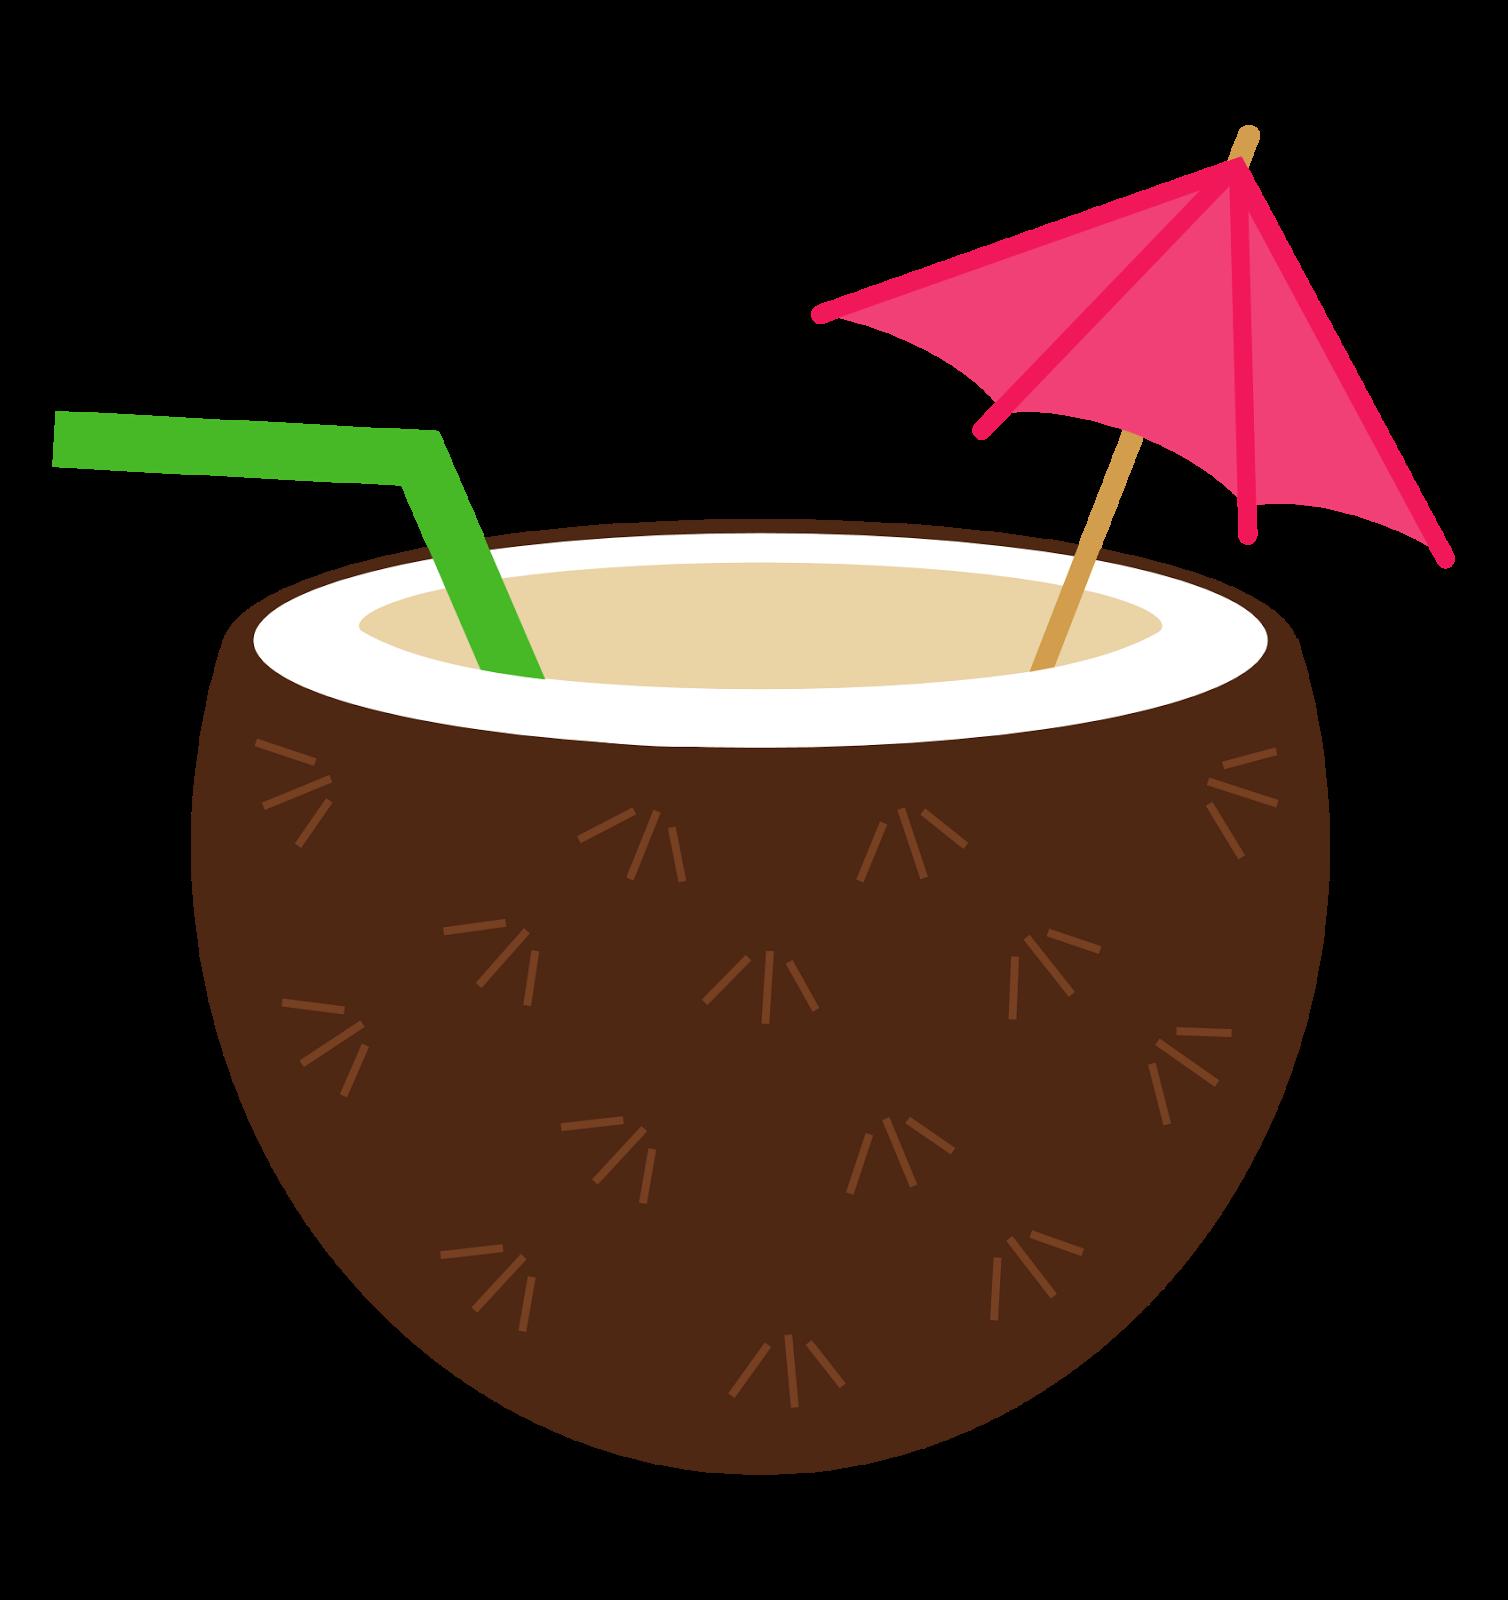 Drink clipart drink hawaii. Hula girl hanslodge cliparts